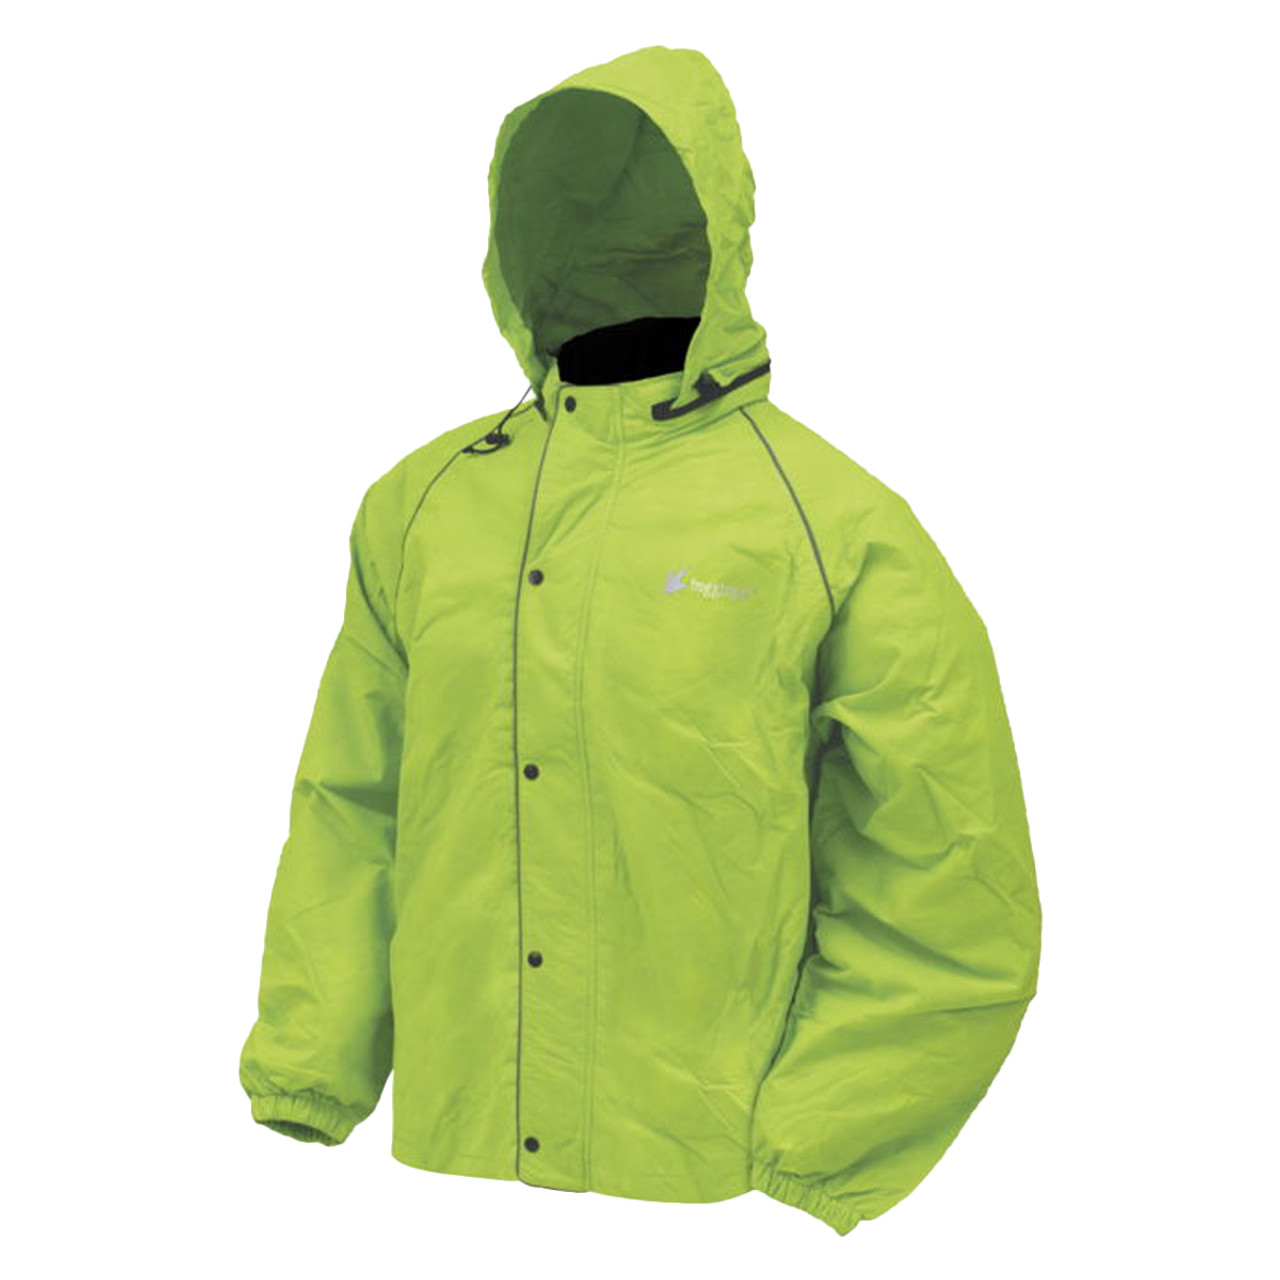 Frogg Toggs Pro Action Rain Jacket Motorcycle Rain Gear